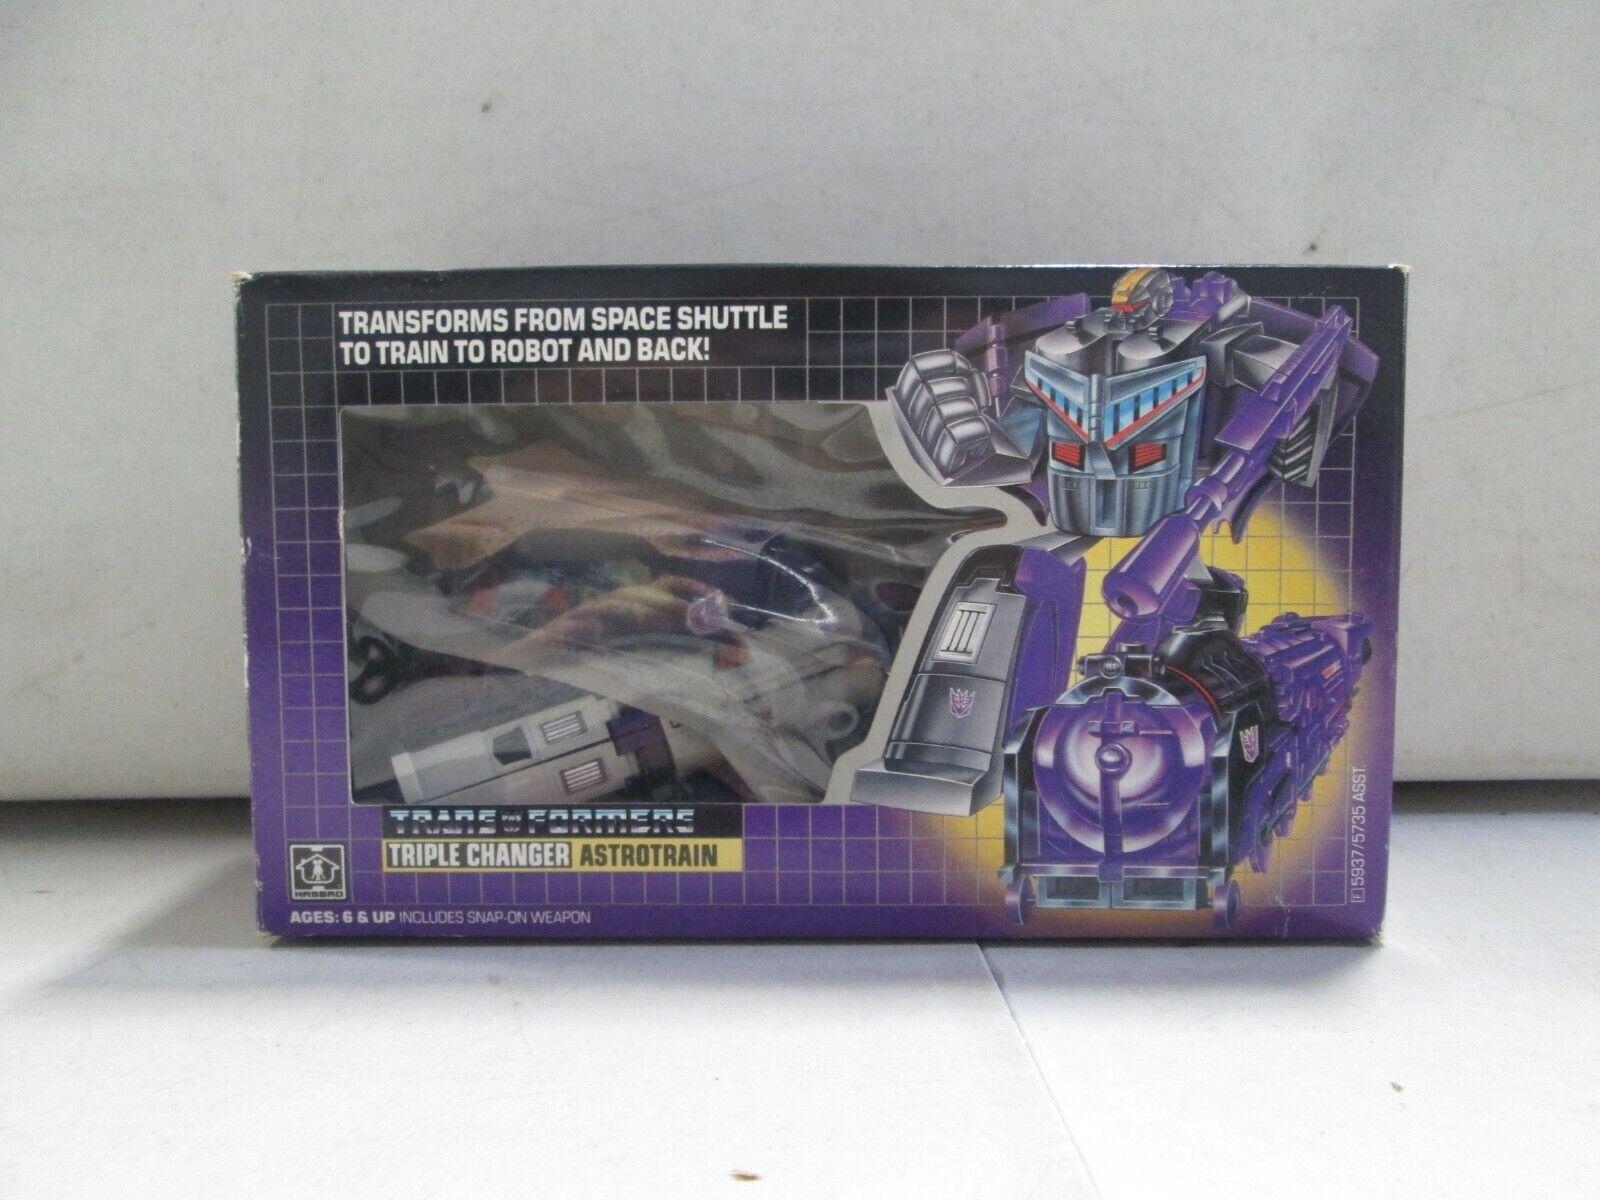 1985 Transformers G1 Triple Changer Astredrain